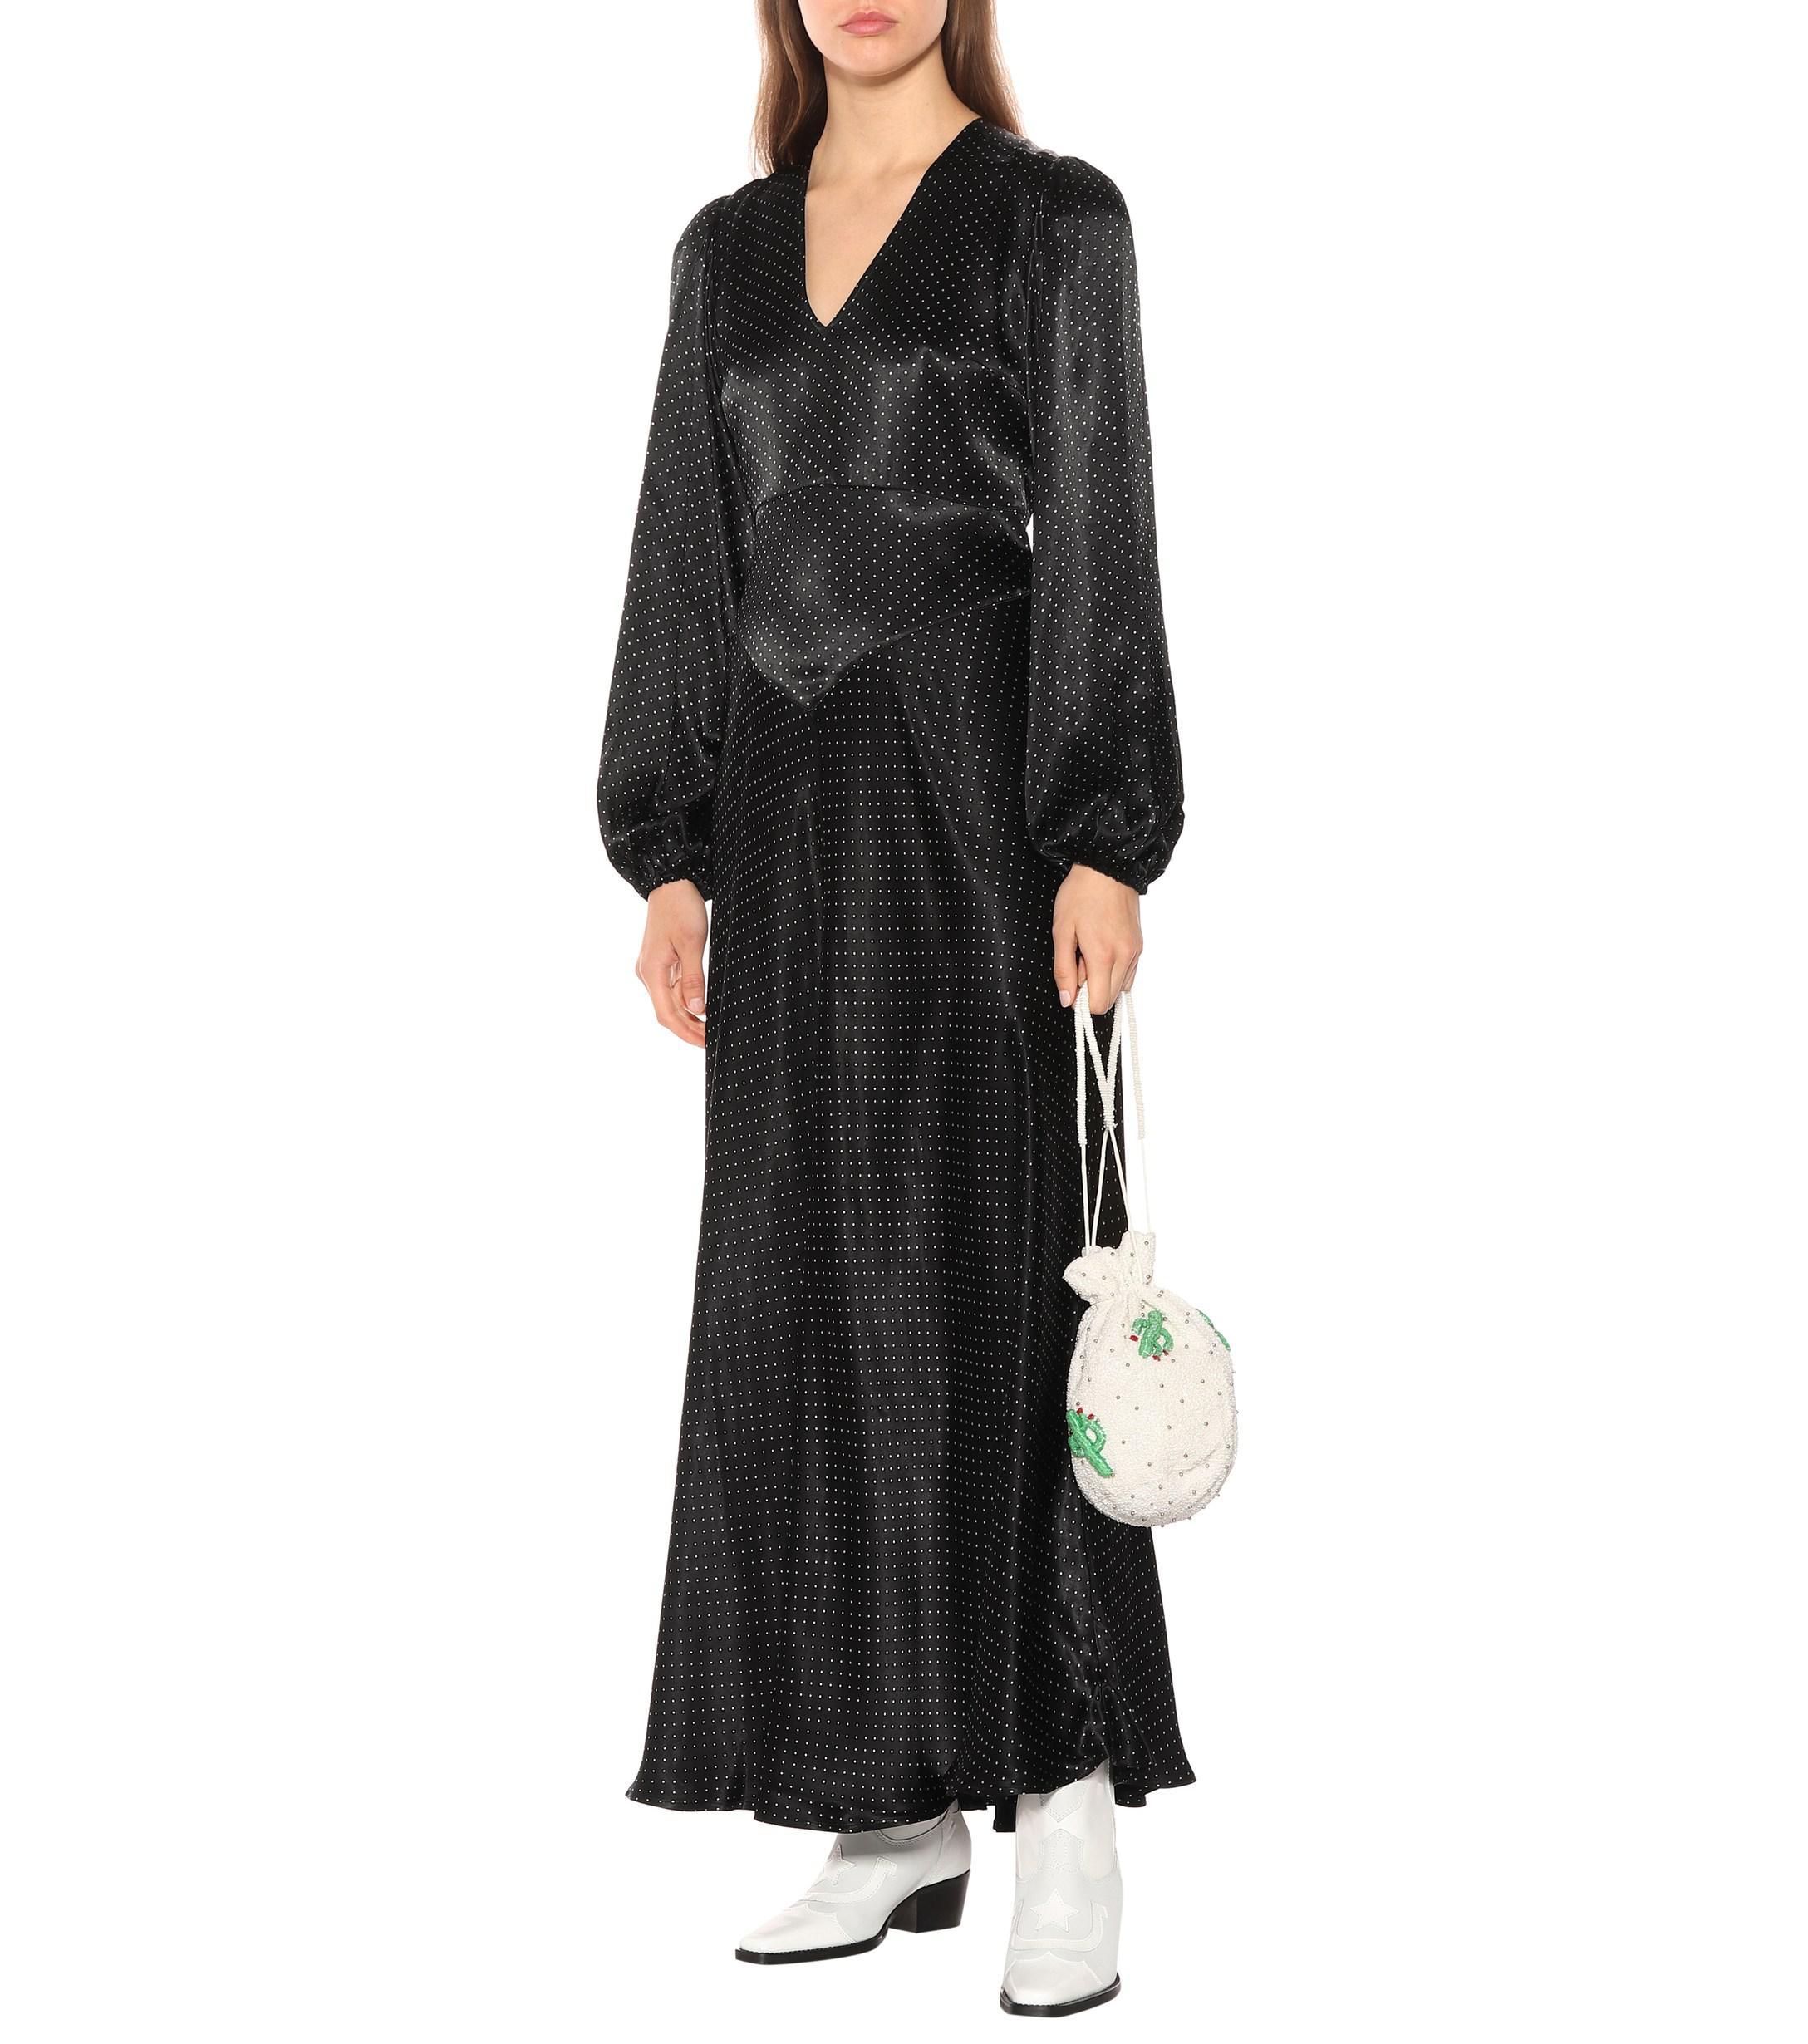 58bff2ddce4 Ganni Cameron Polka Dot Maxi Dress in Black - Save 1.470588235294116 ...